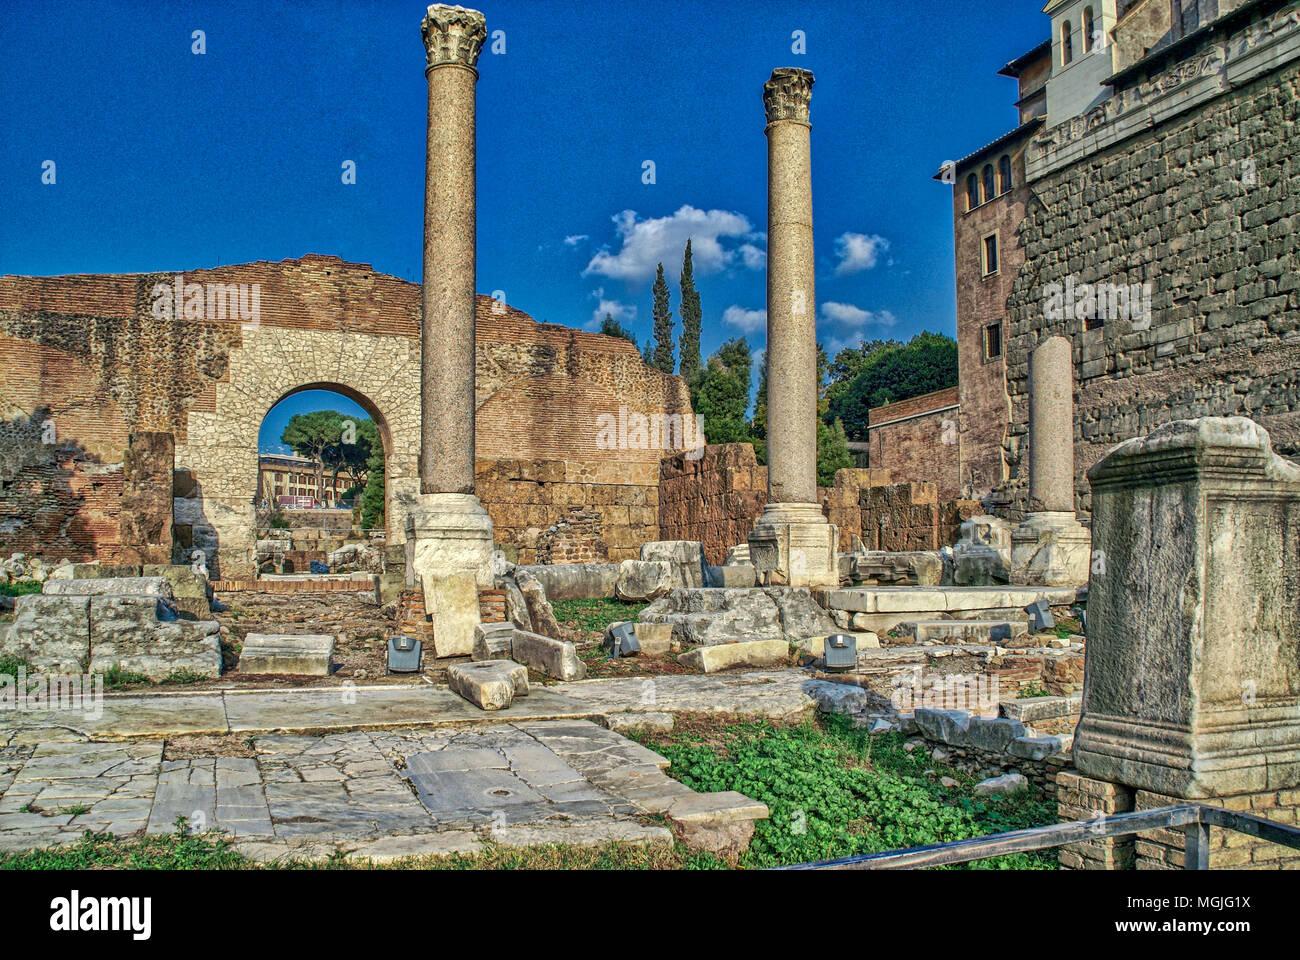 Roman Forum. Rome, Italy - Stock Image